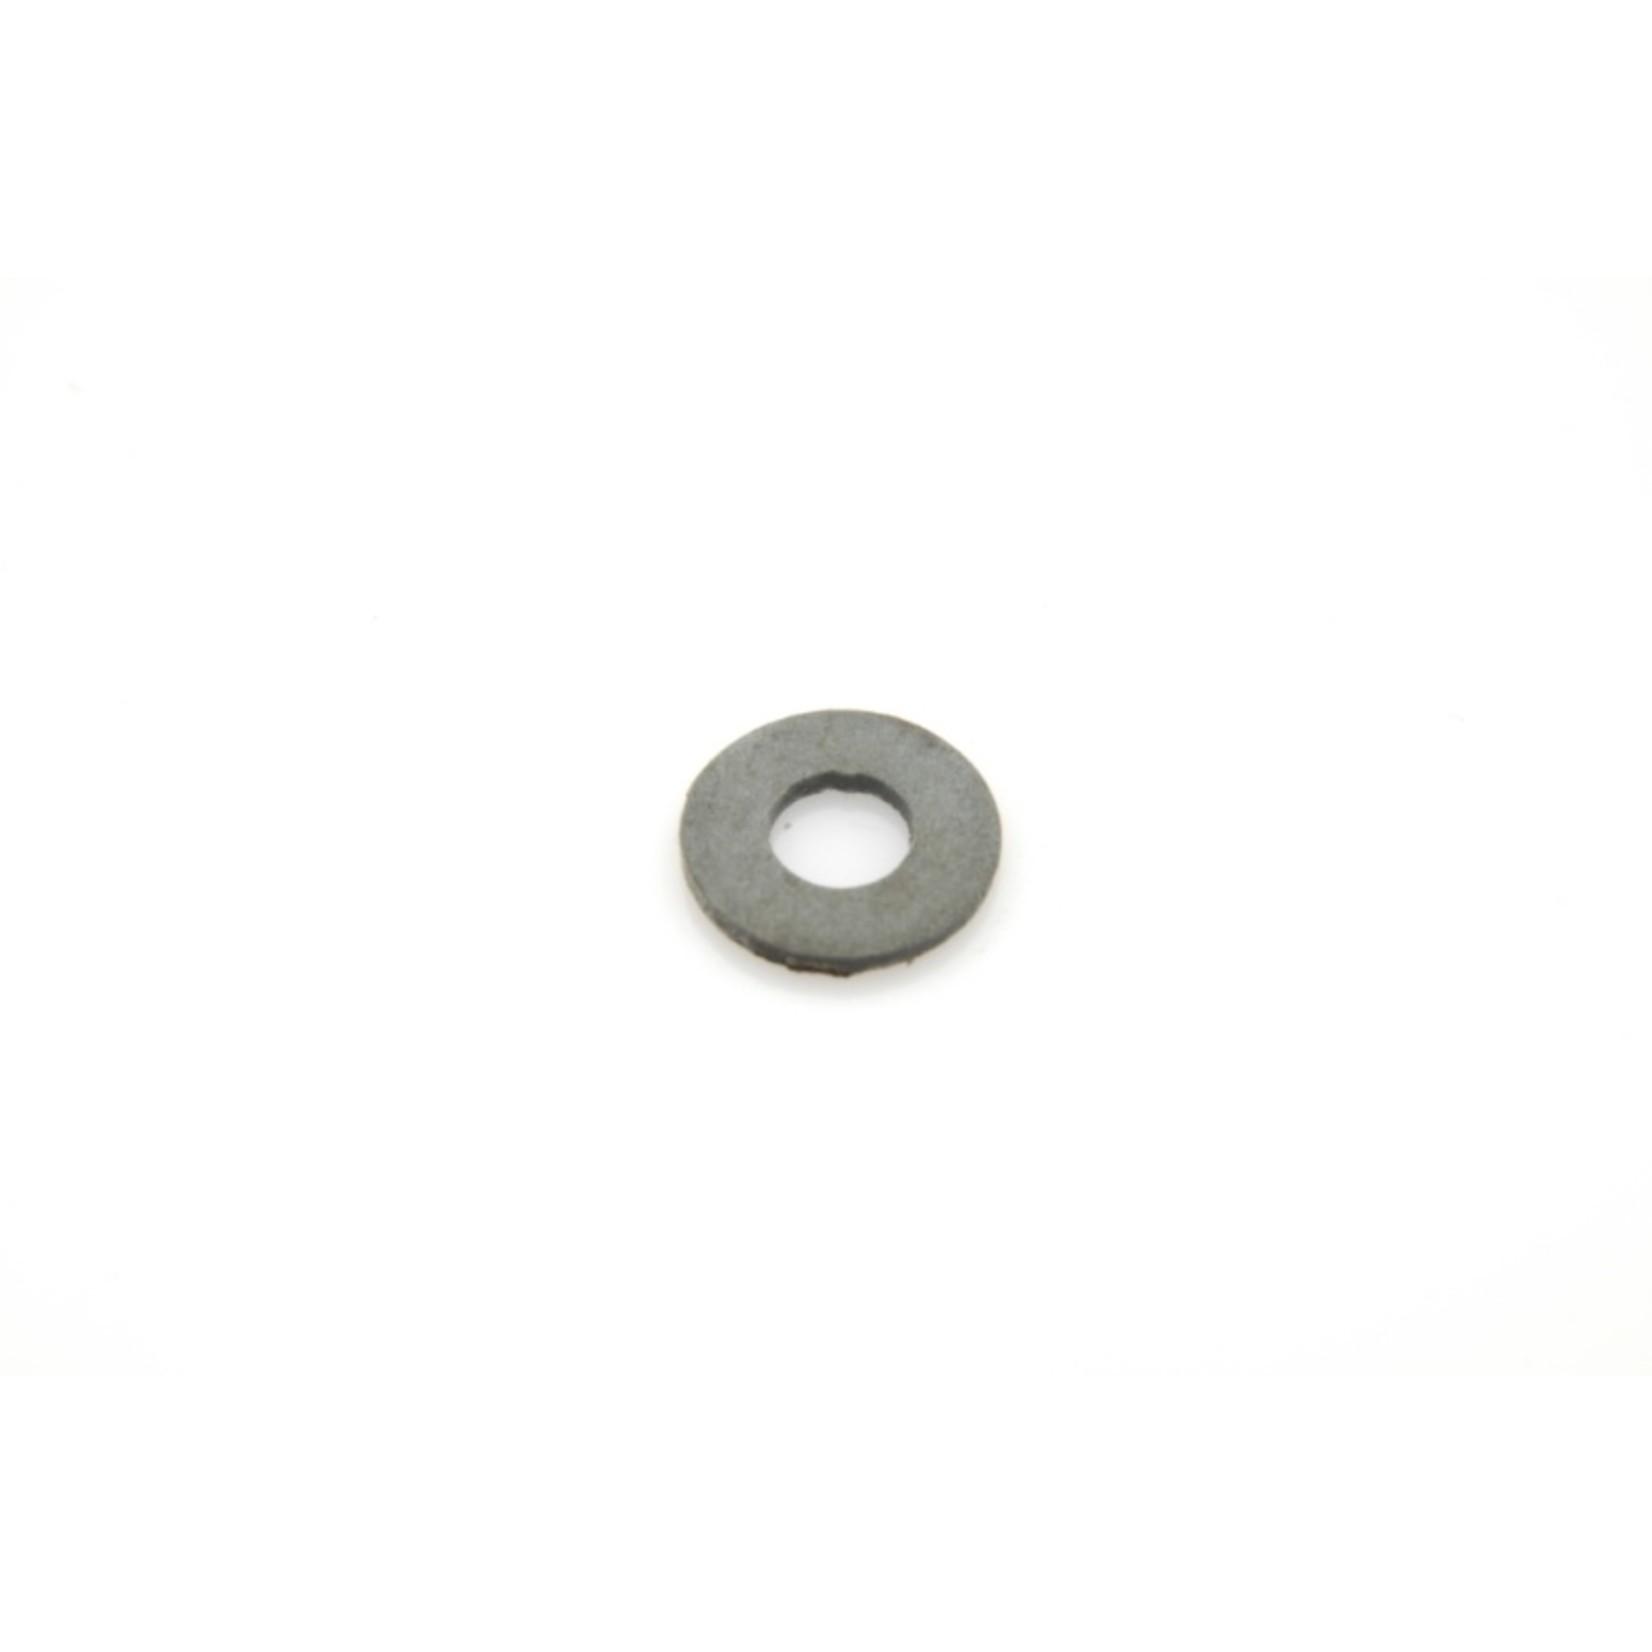 Arandela de fibre manecilla interior -72 Nr Org: 75522048